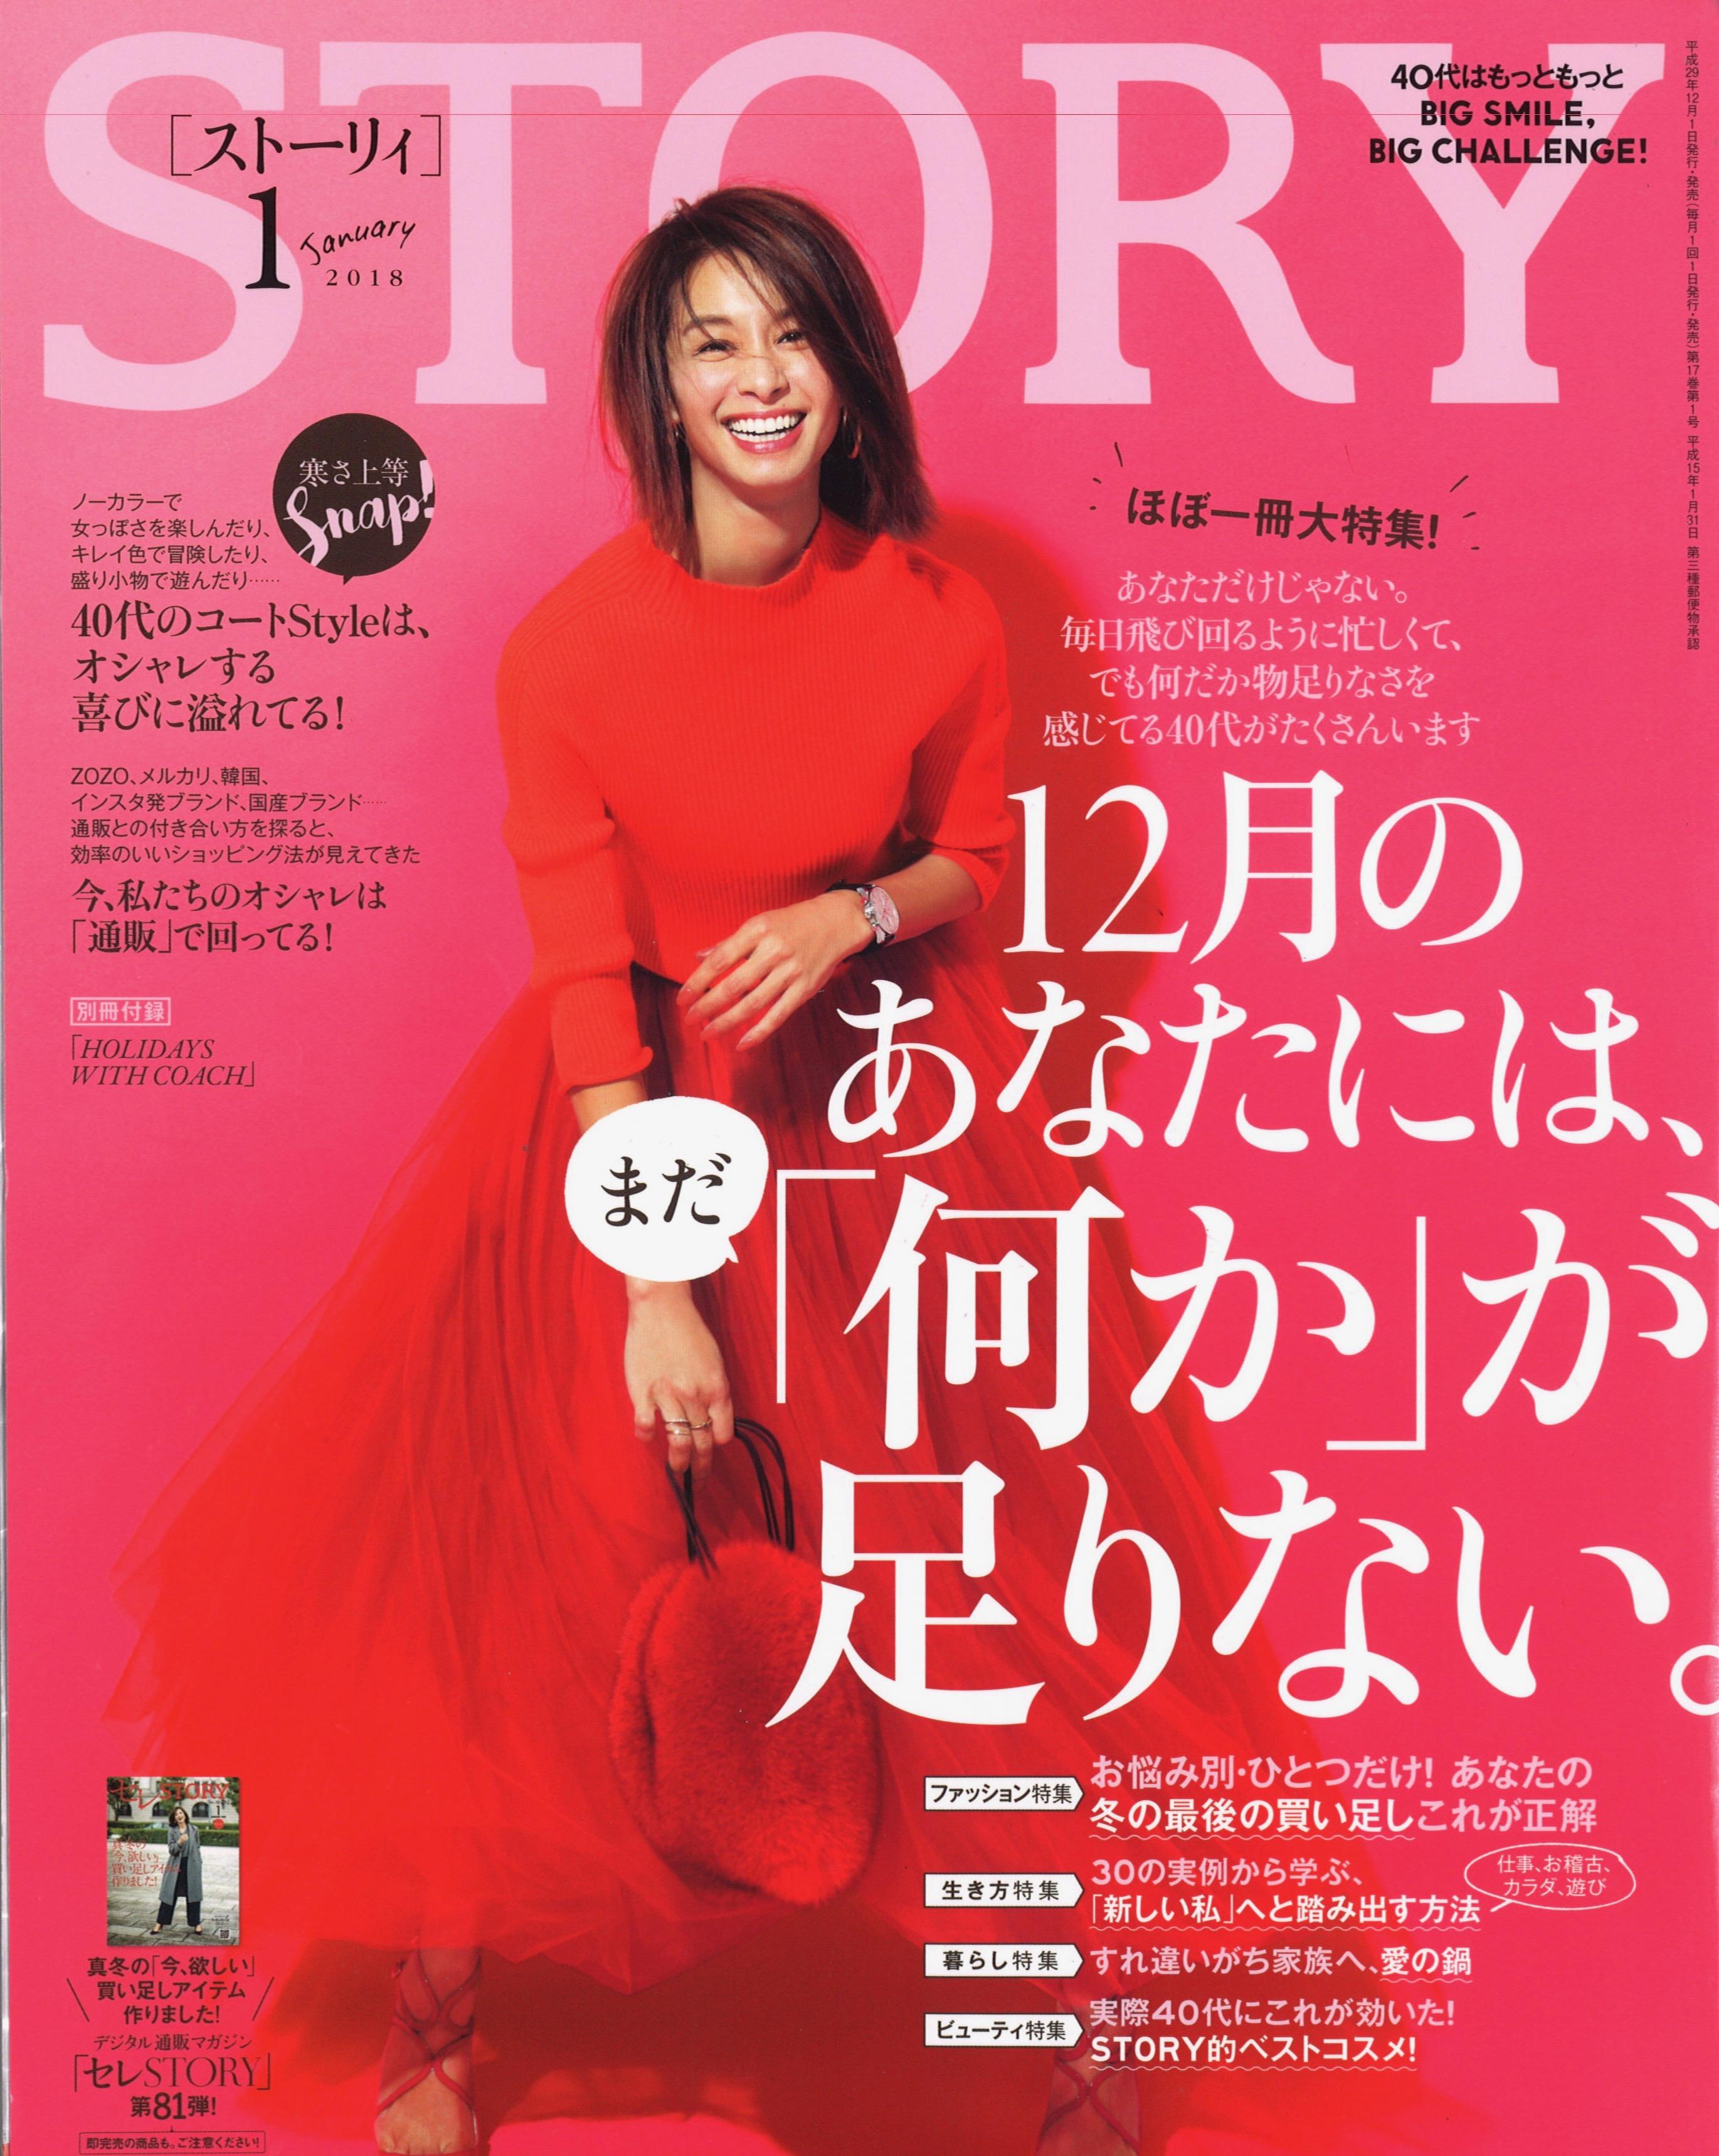 Story 01